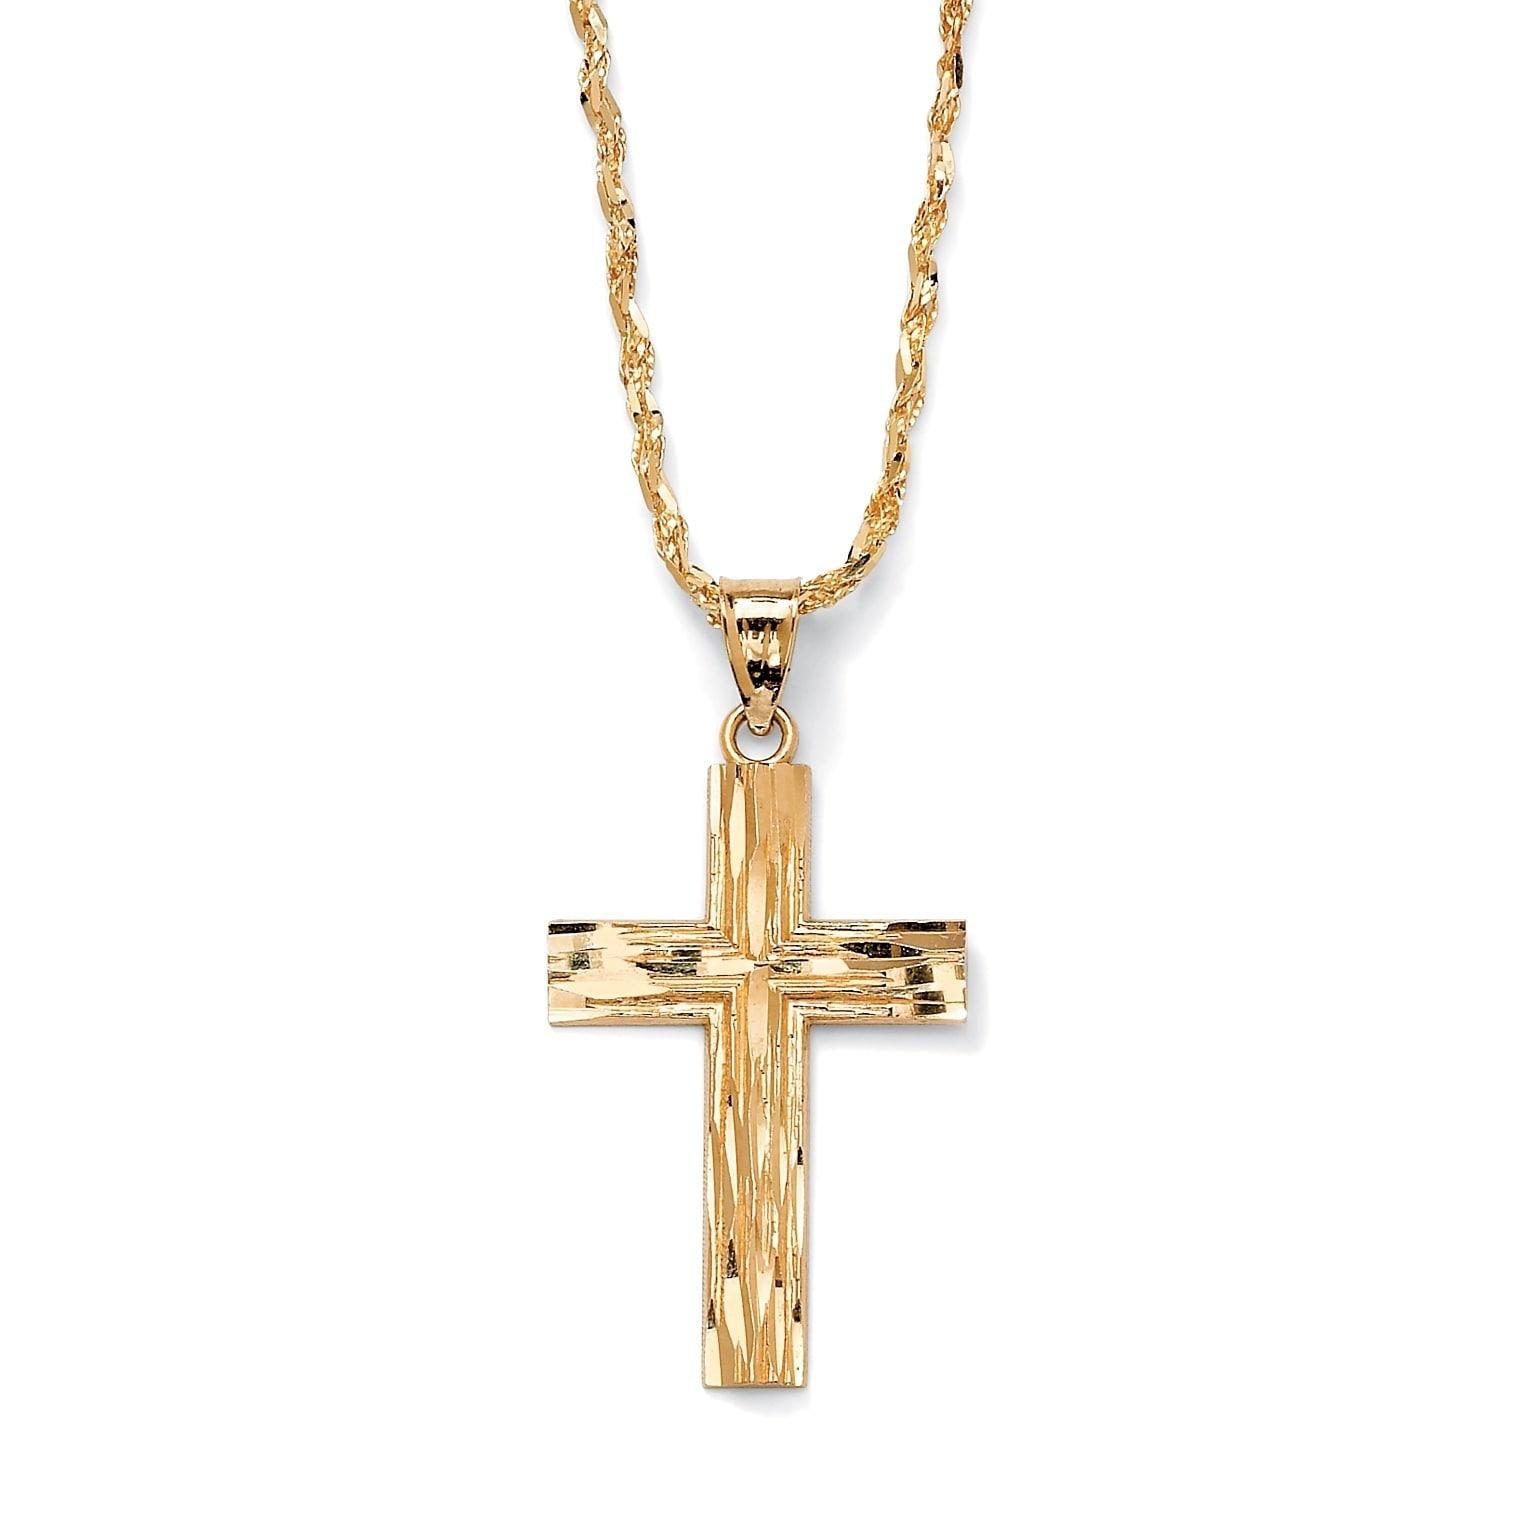 10k Yellow Gold Diamond Cut Polished /& Textured Cross Pendant